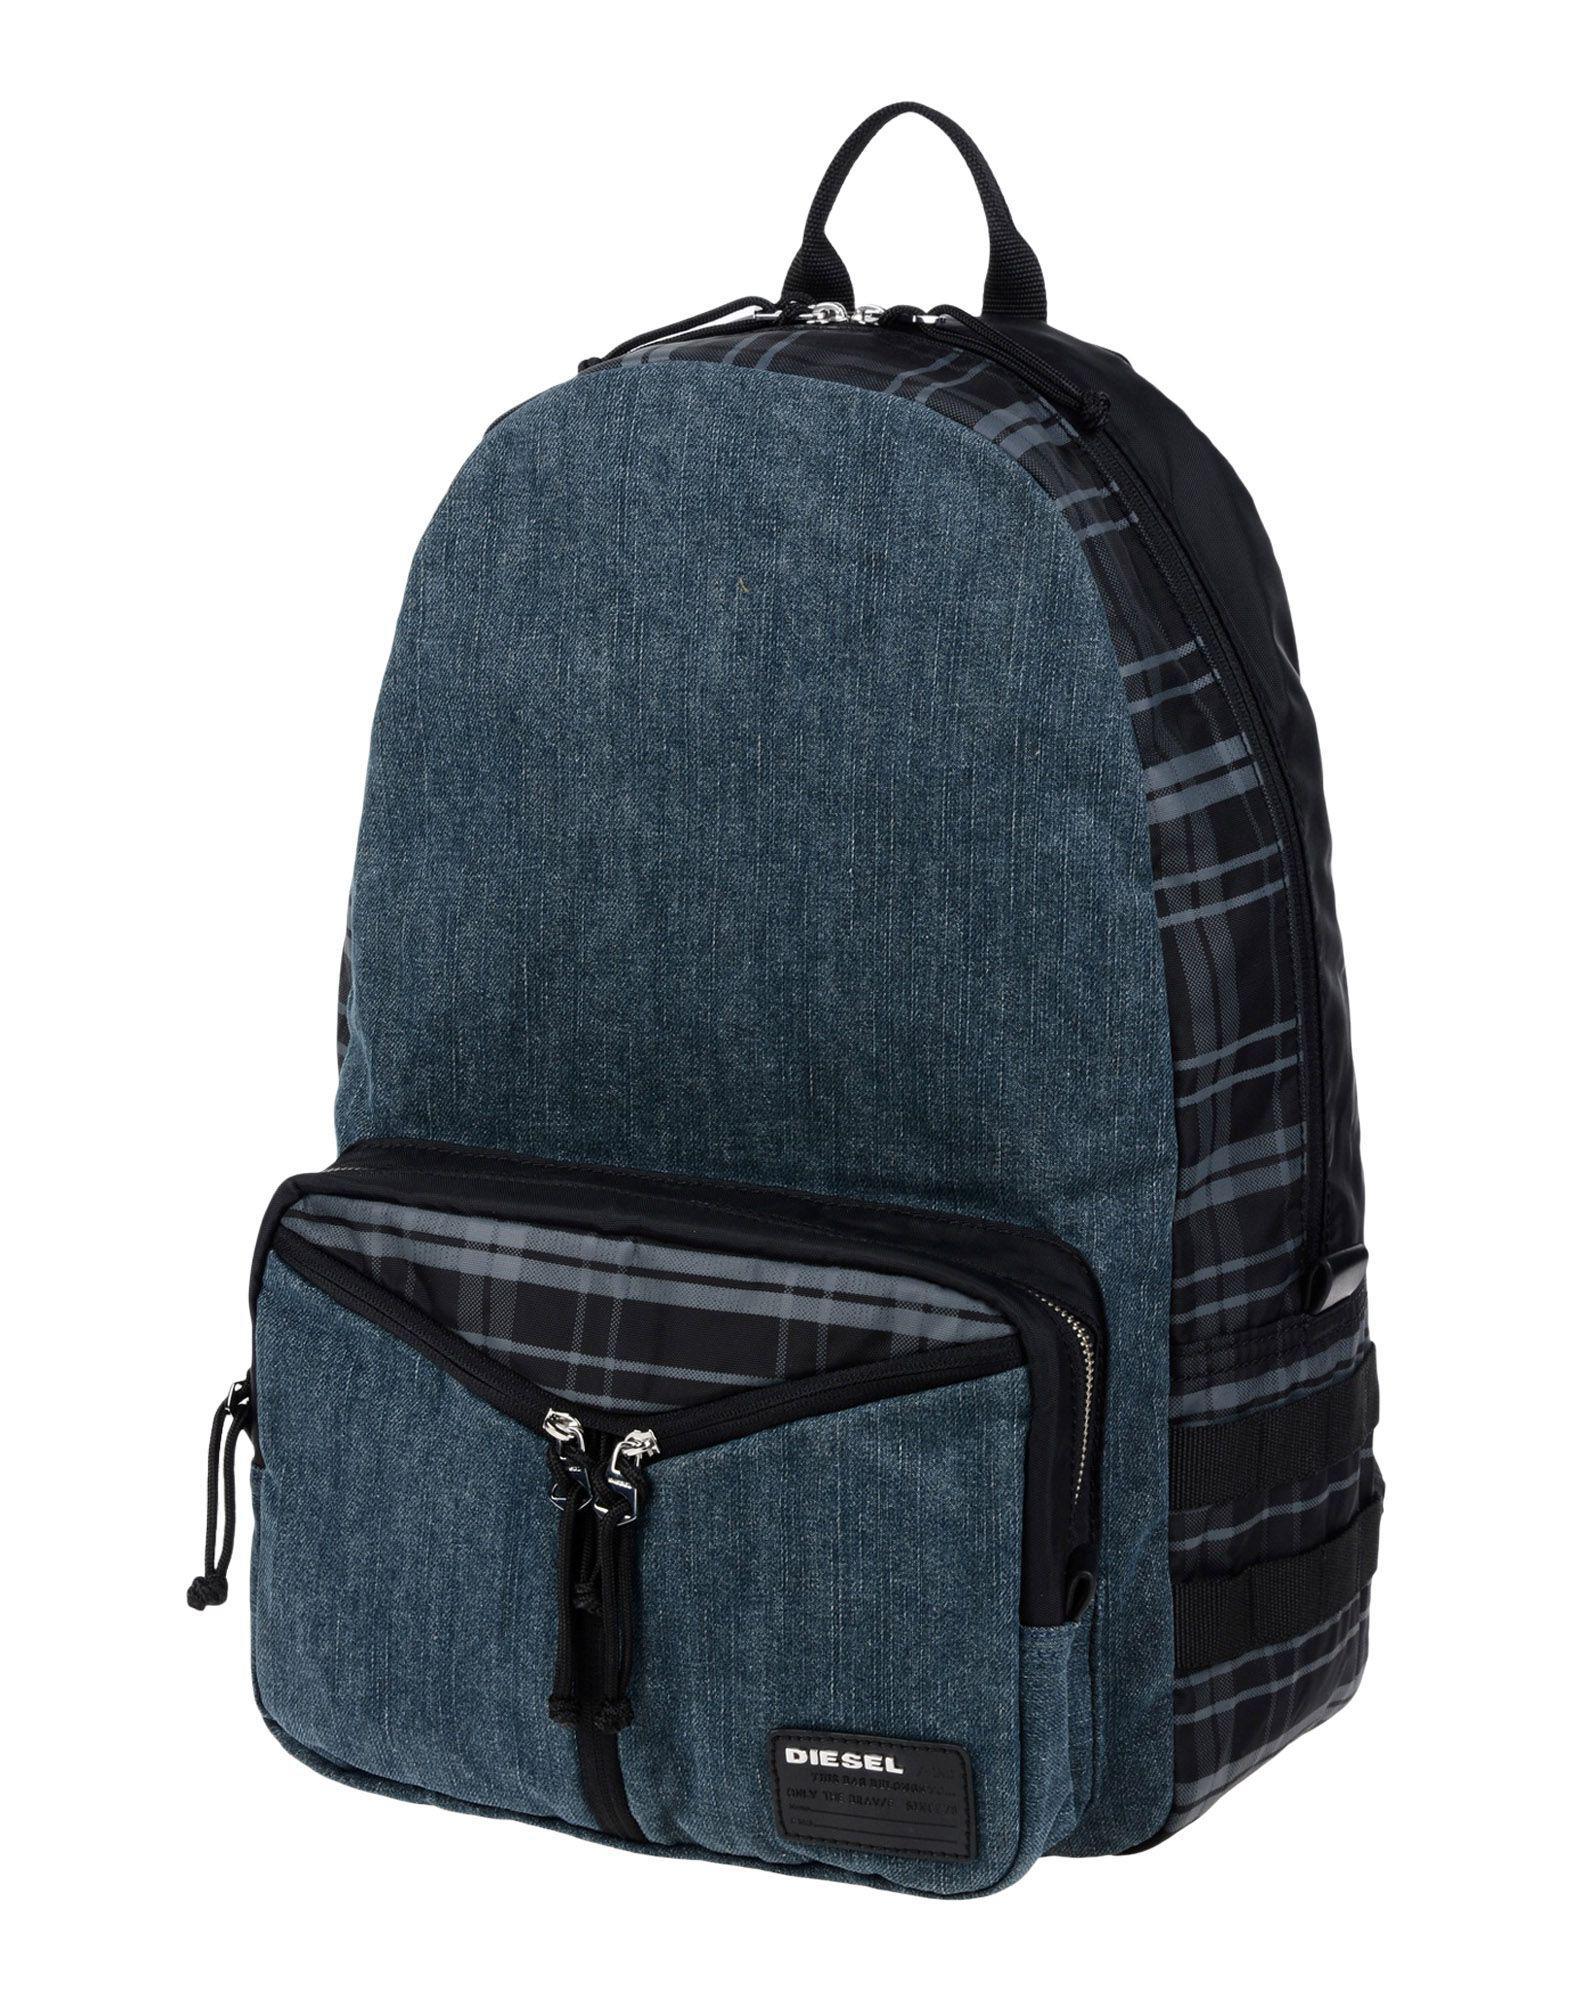 BAGS - Backpacks & Bum bags Diesel bATokOk